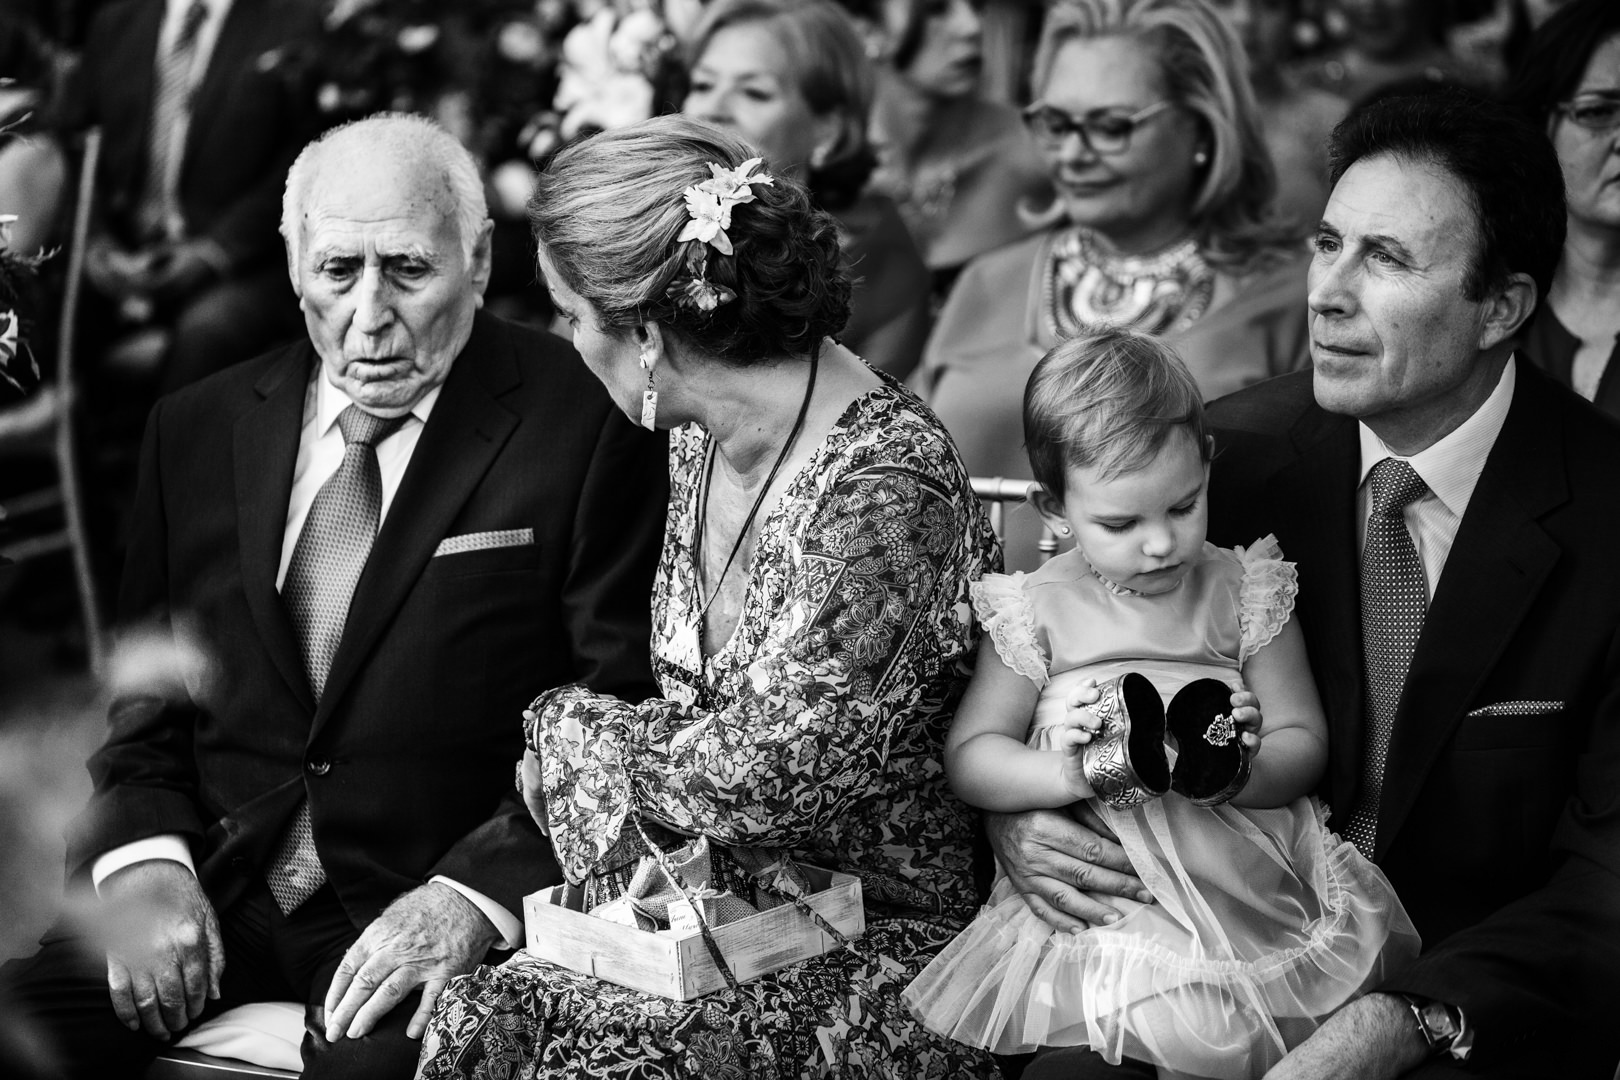 Boda-Irene-Marcos-Dos-Hermanas-Finca-Clotidle-engagement-Rafael-Torres-fotografo-bodas-sevilla-madrid-barcelona-wedding-photographer--20.jpg